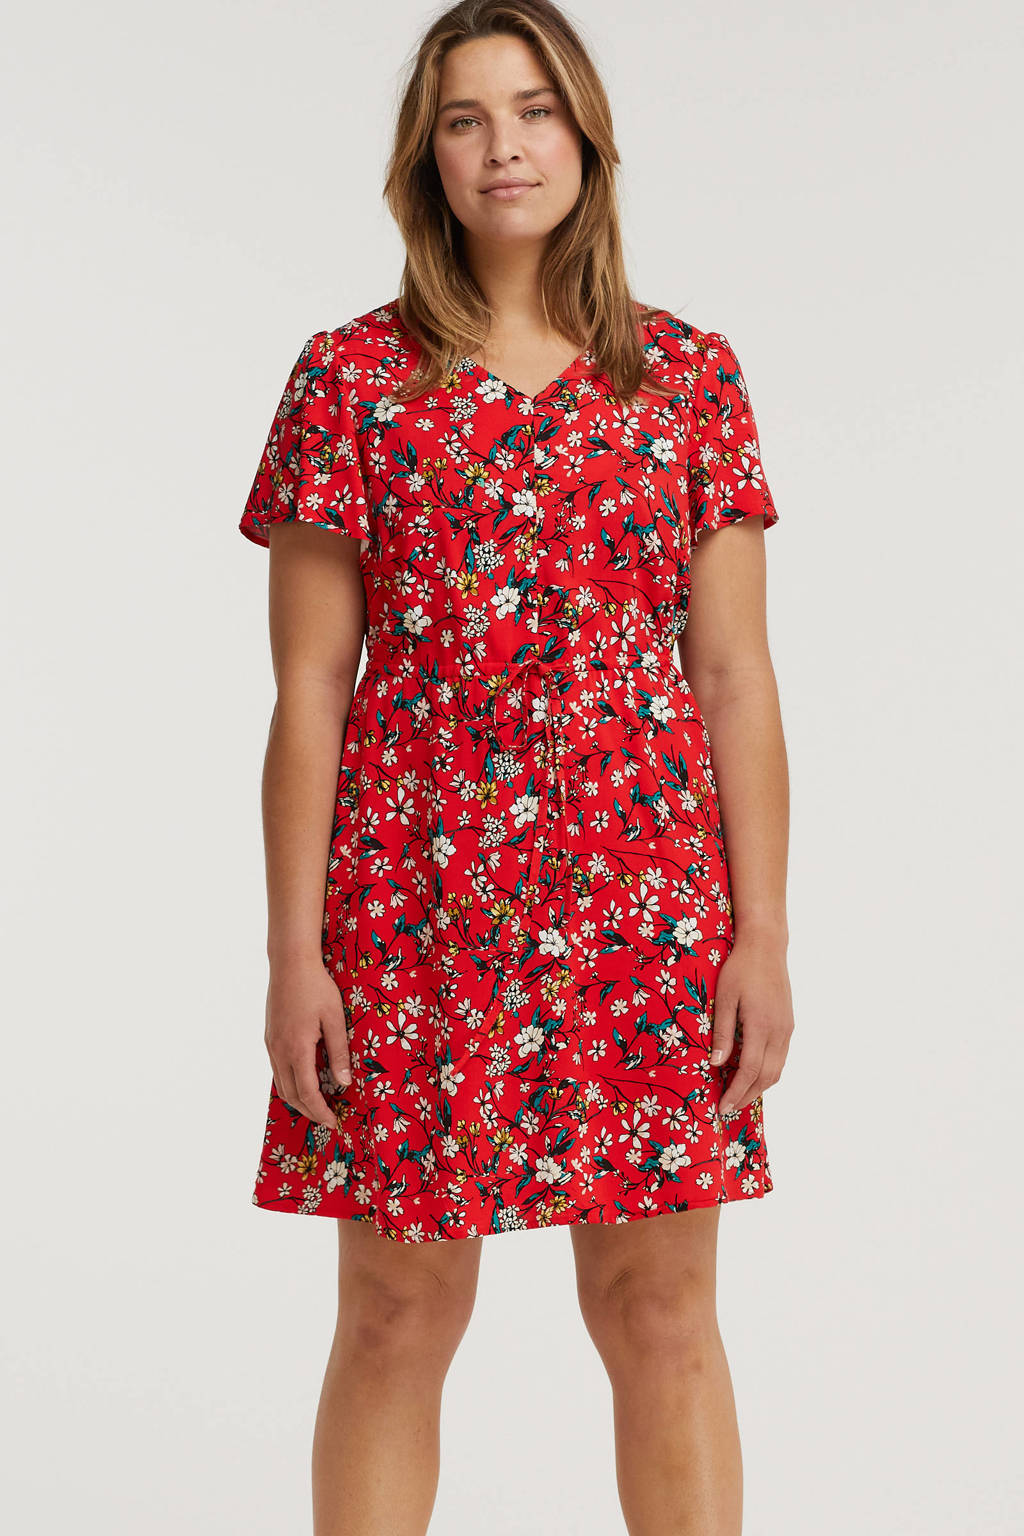 VERO MODA CURVE gebloemde jurk VMSIMPLY rood/donkergroen/lichtroze, Rood/donkergroen/lichtroze